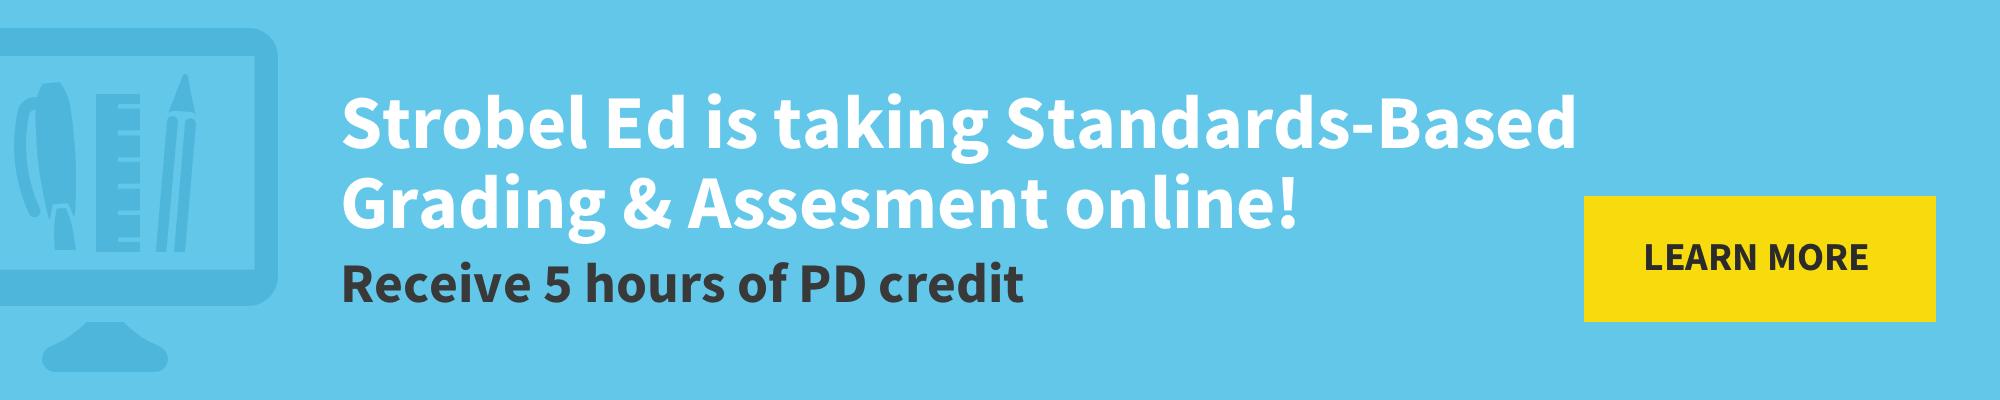 standards based grading online